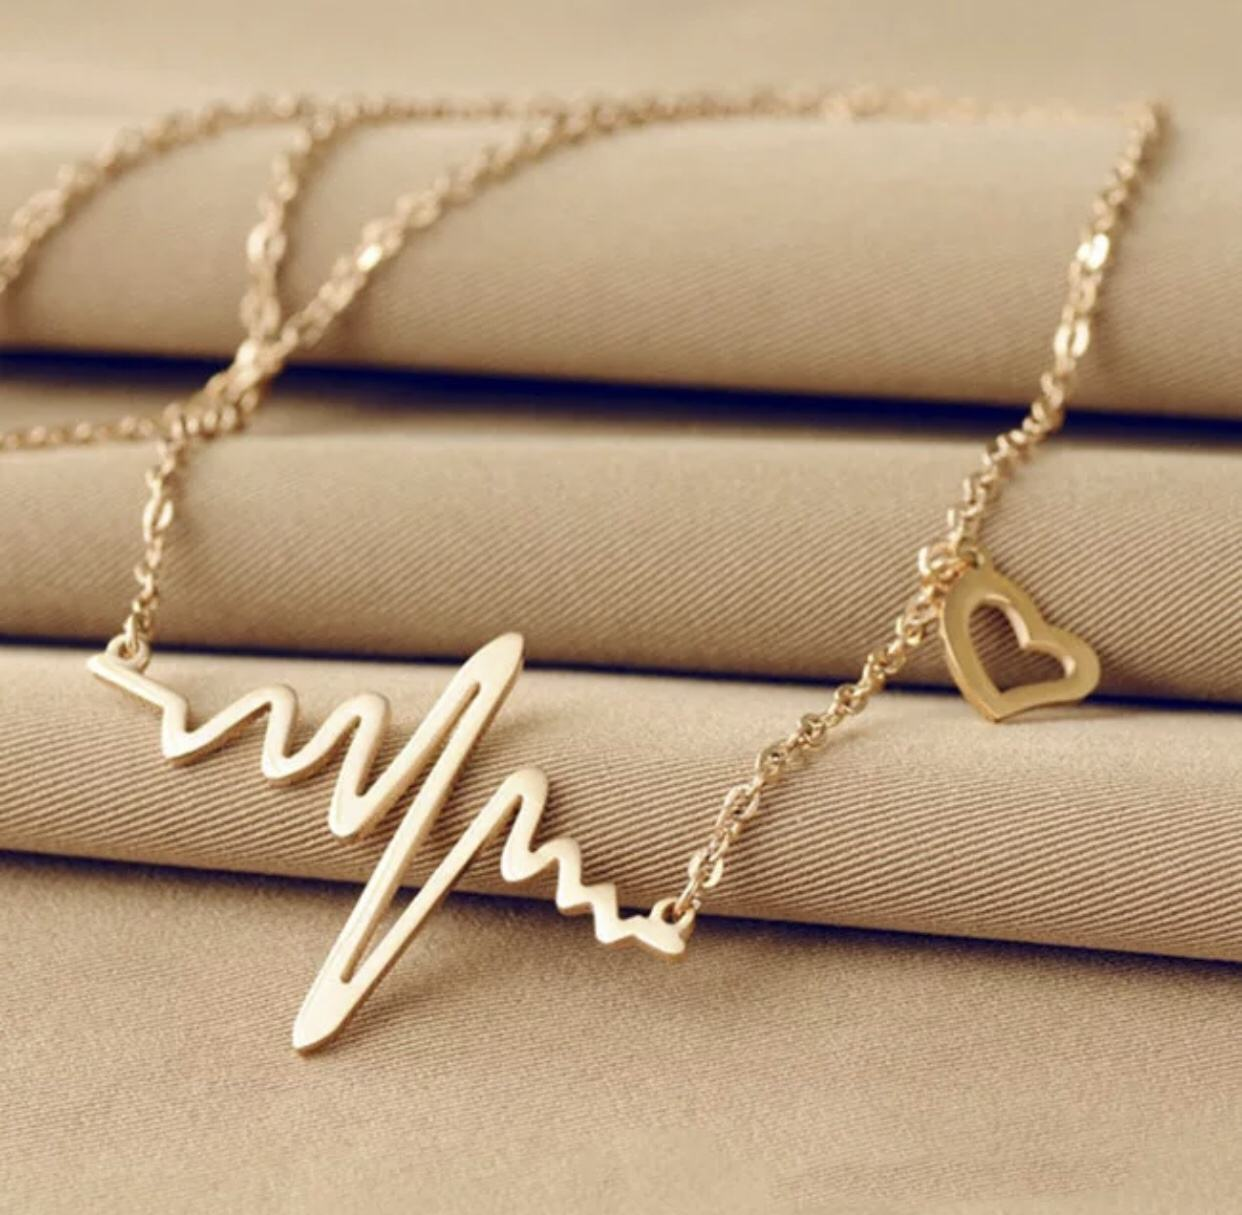 Ecg Necklace Heart Beat Wave Necklace Pendant For Women